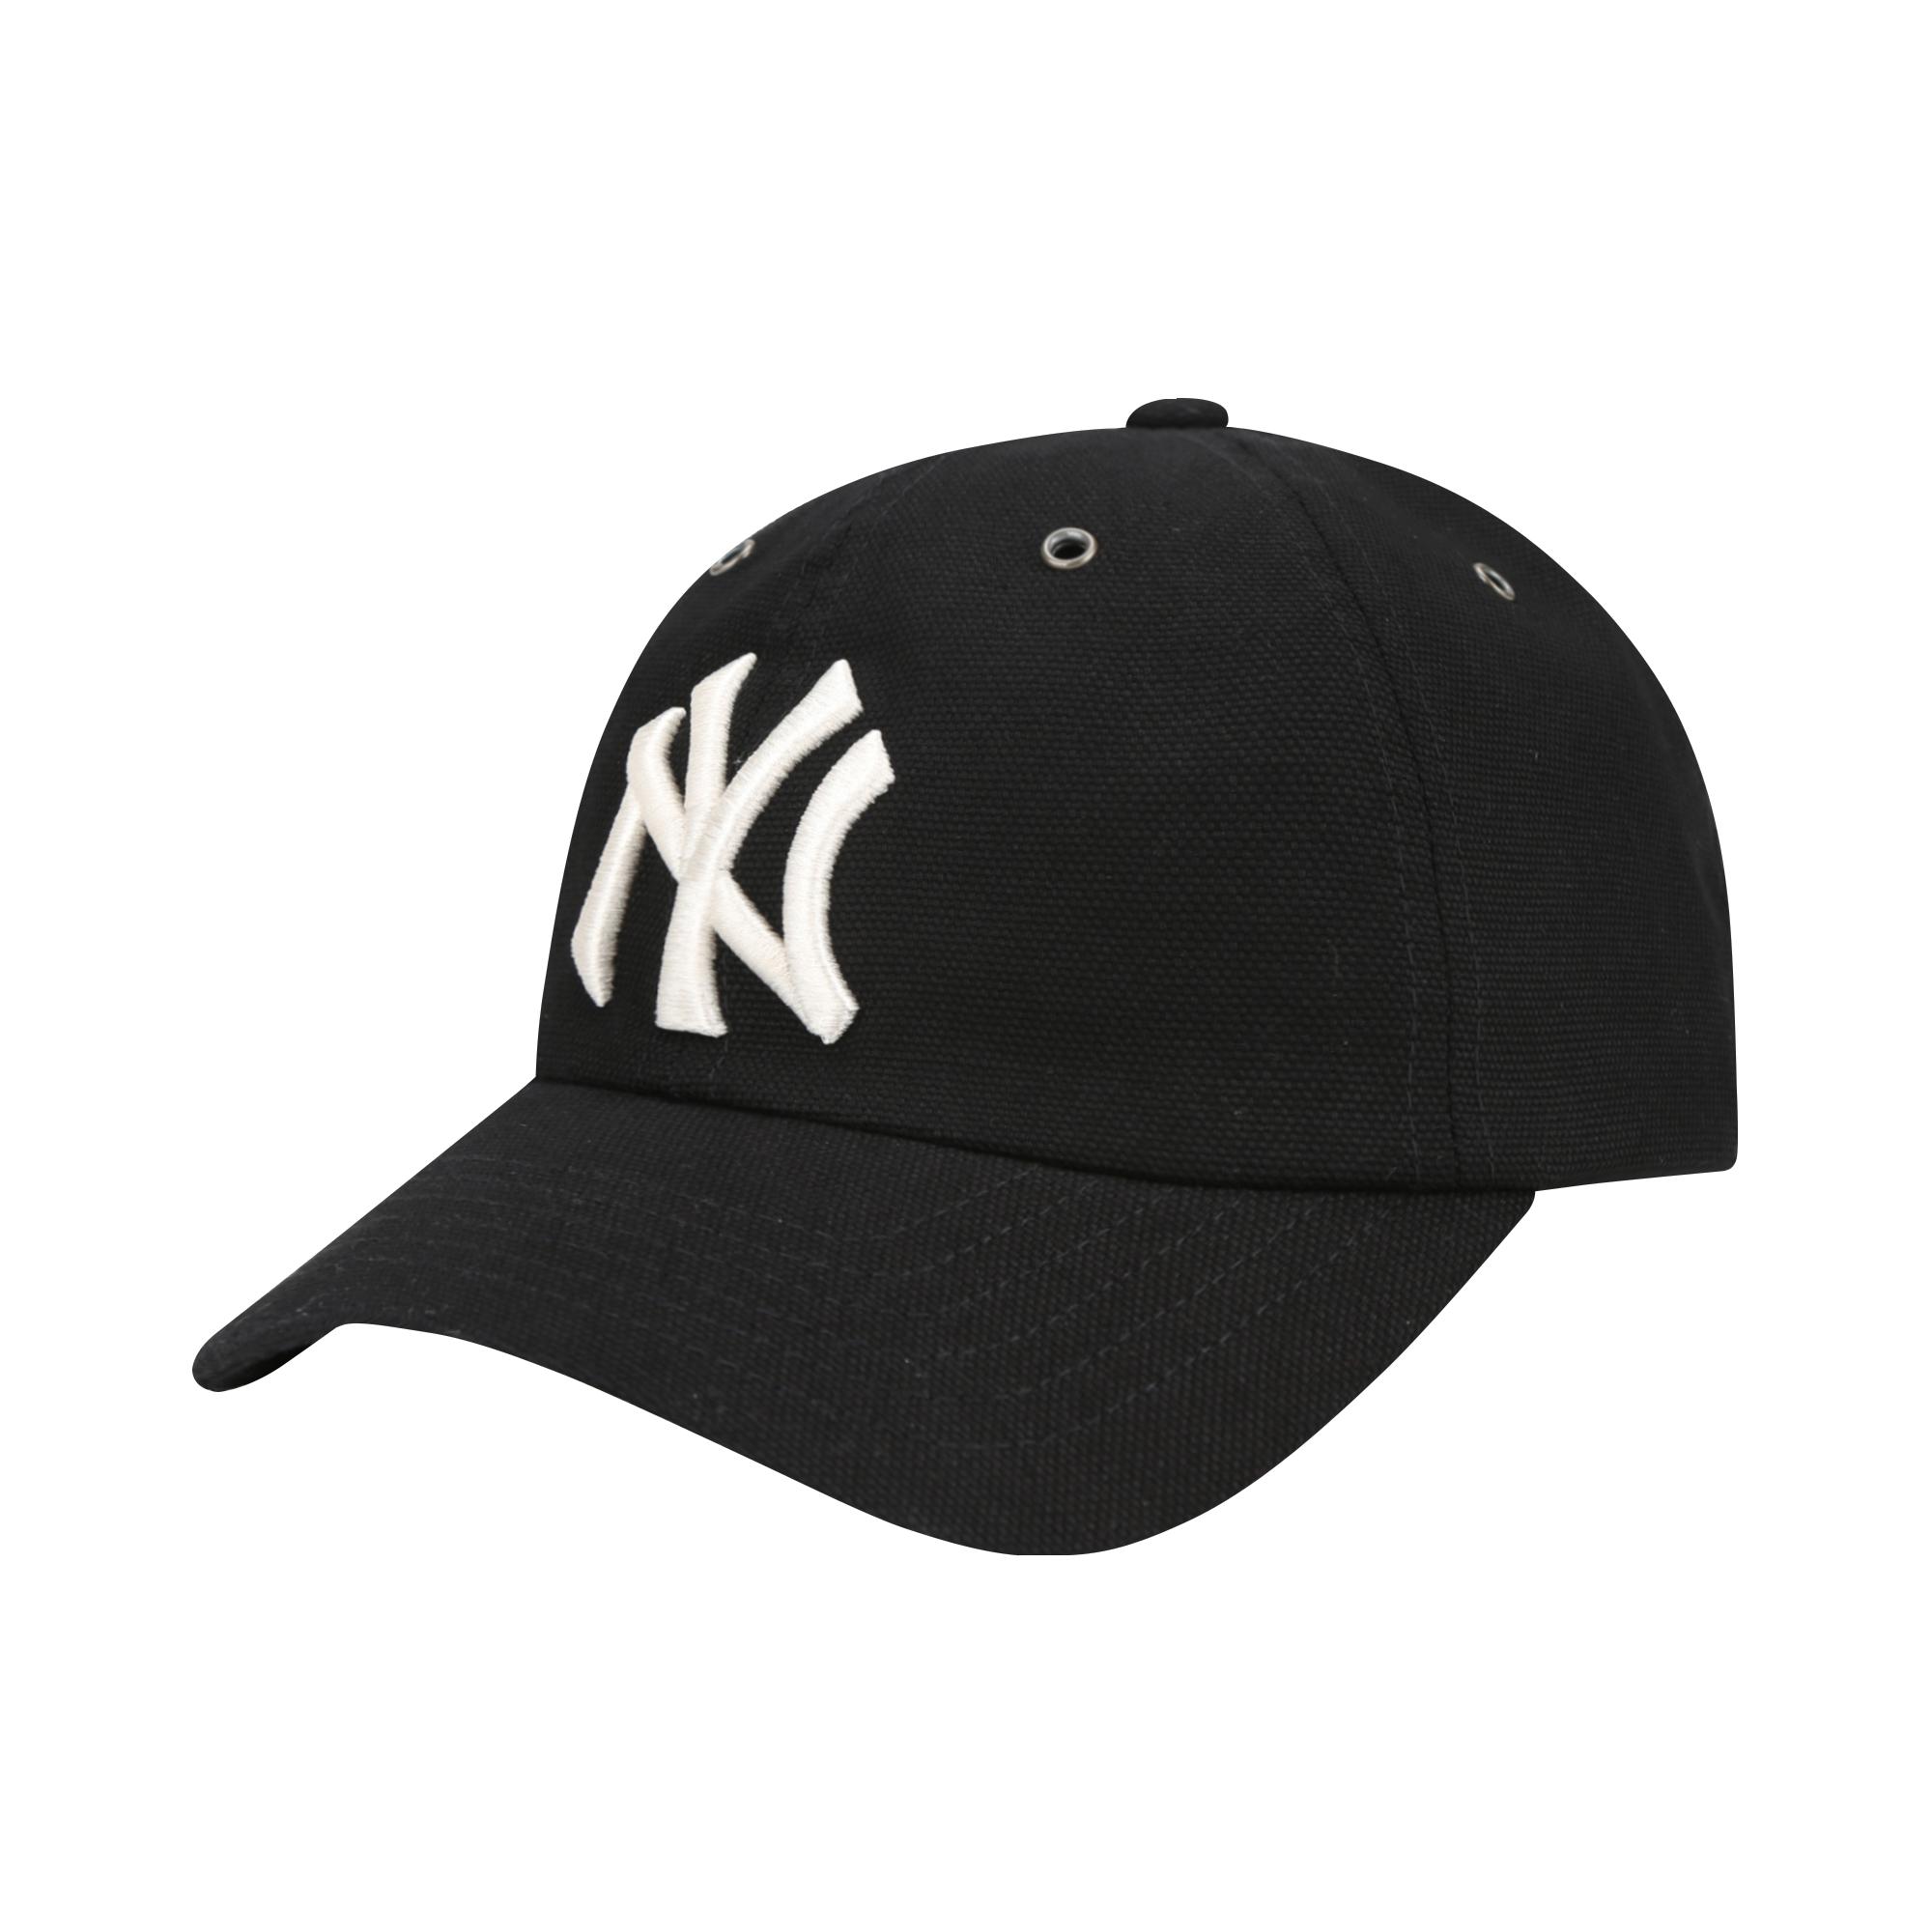 NEW YORK YANKEES VINTAGE OXFORD BALL CAP